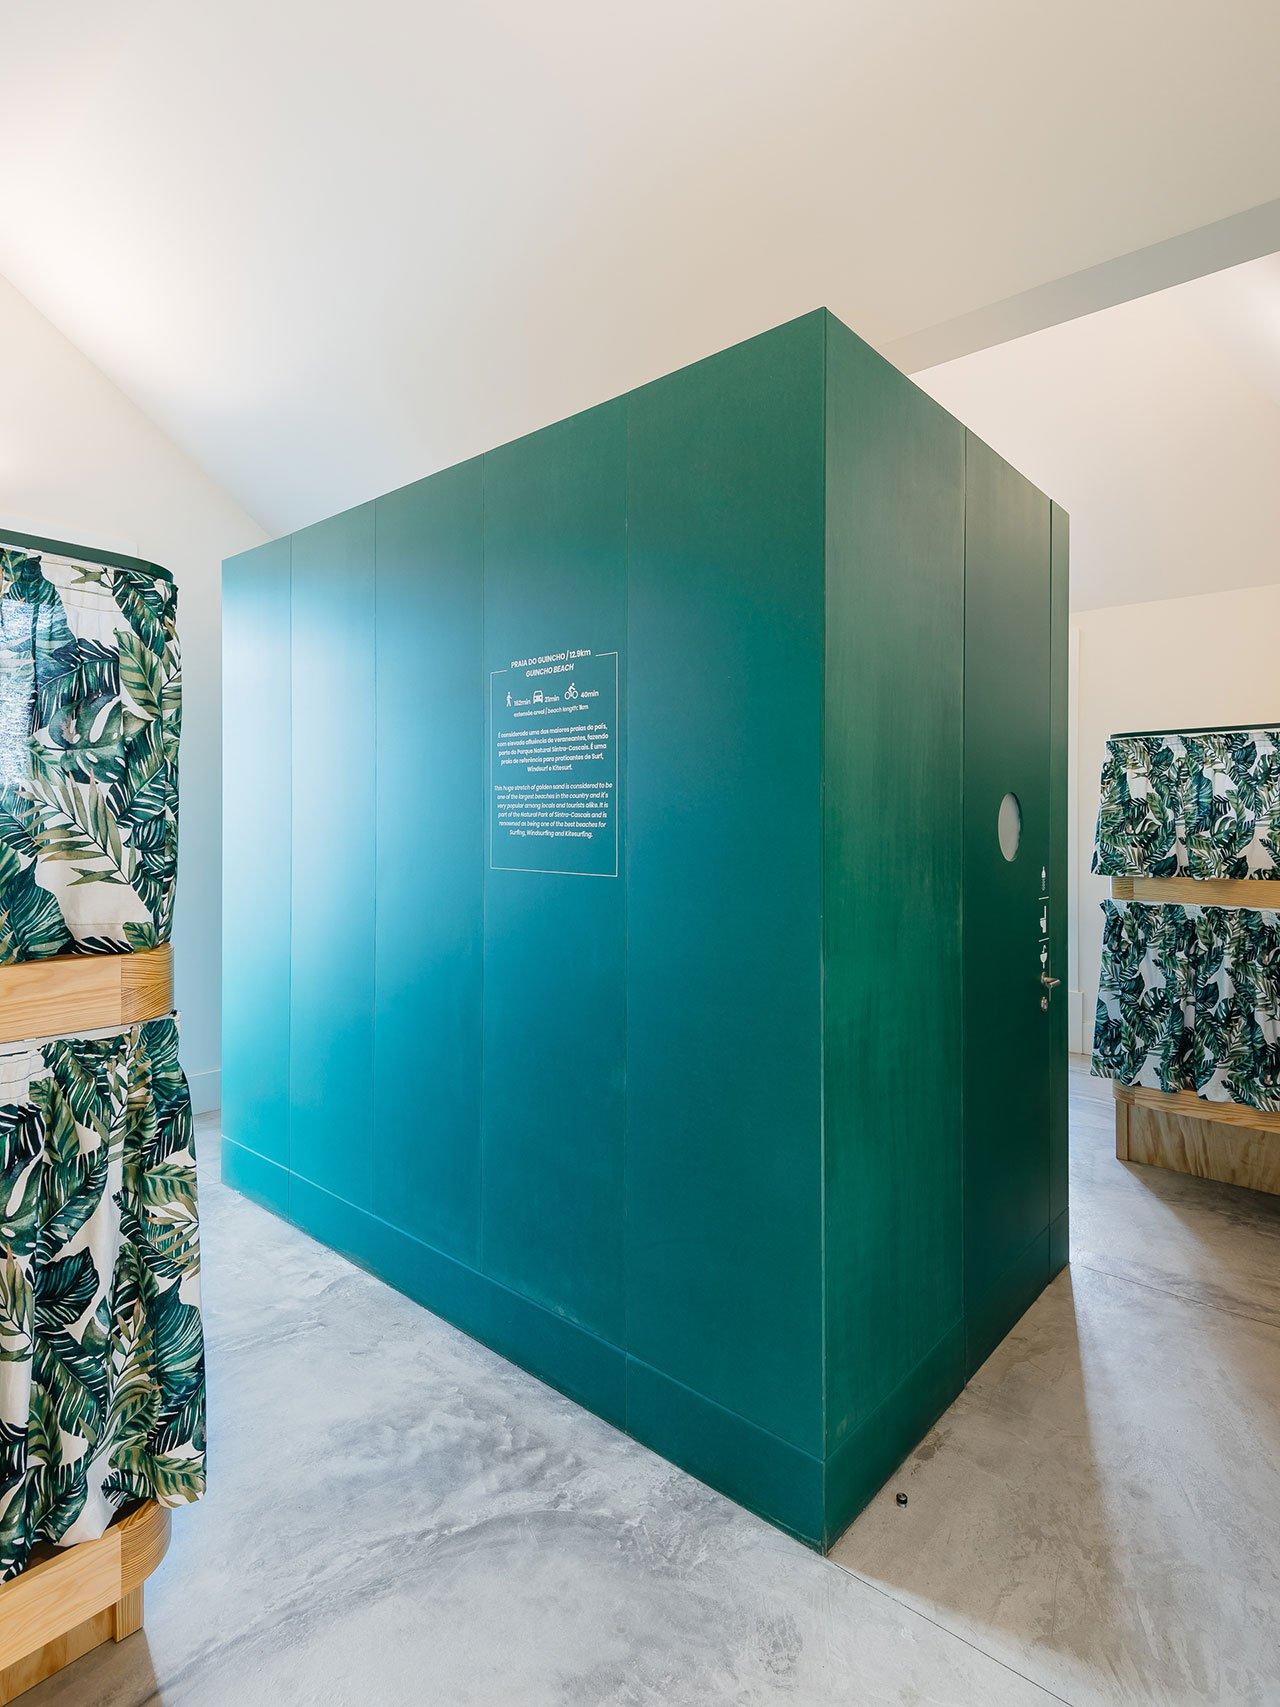 s13_hostel_in_parede_cascais_portugal_aurora_arquitectos_photo_do_mal_o_menos_yatzer.jpg